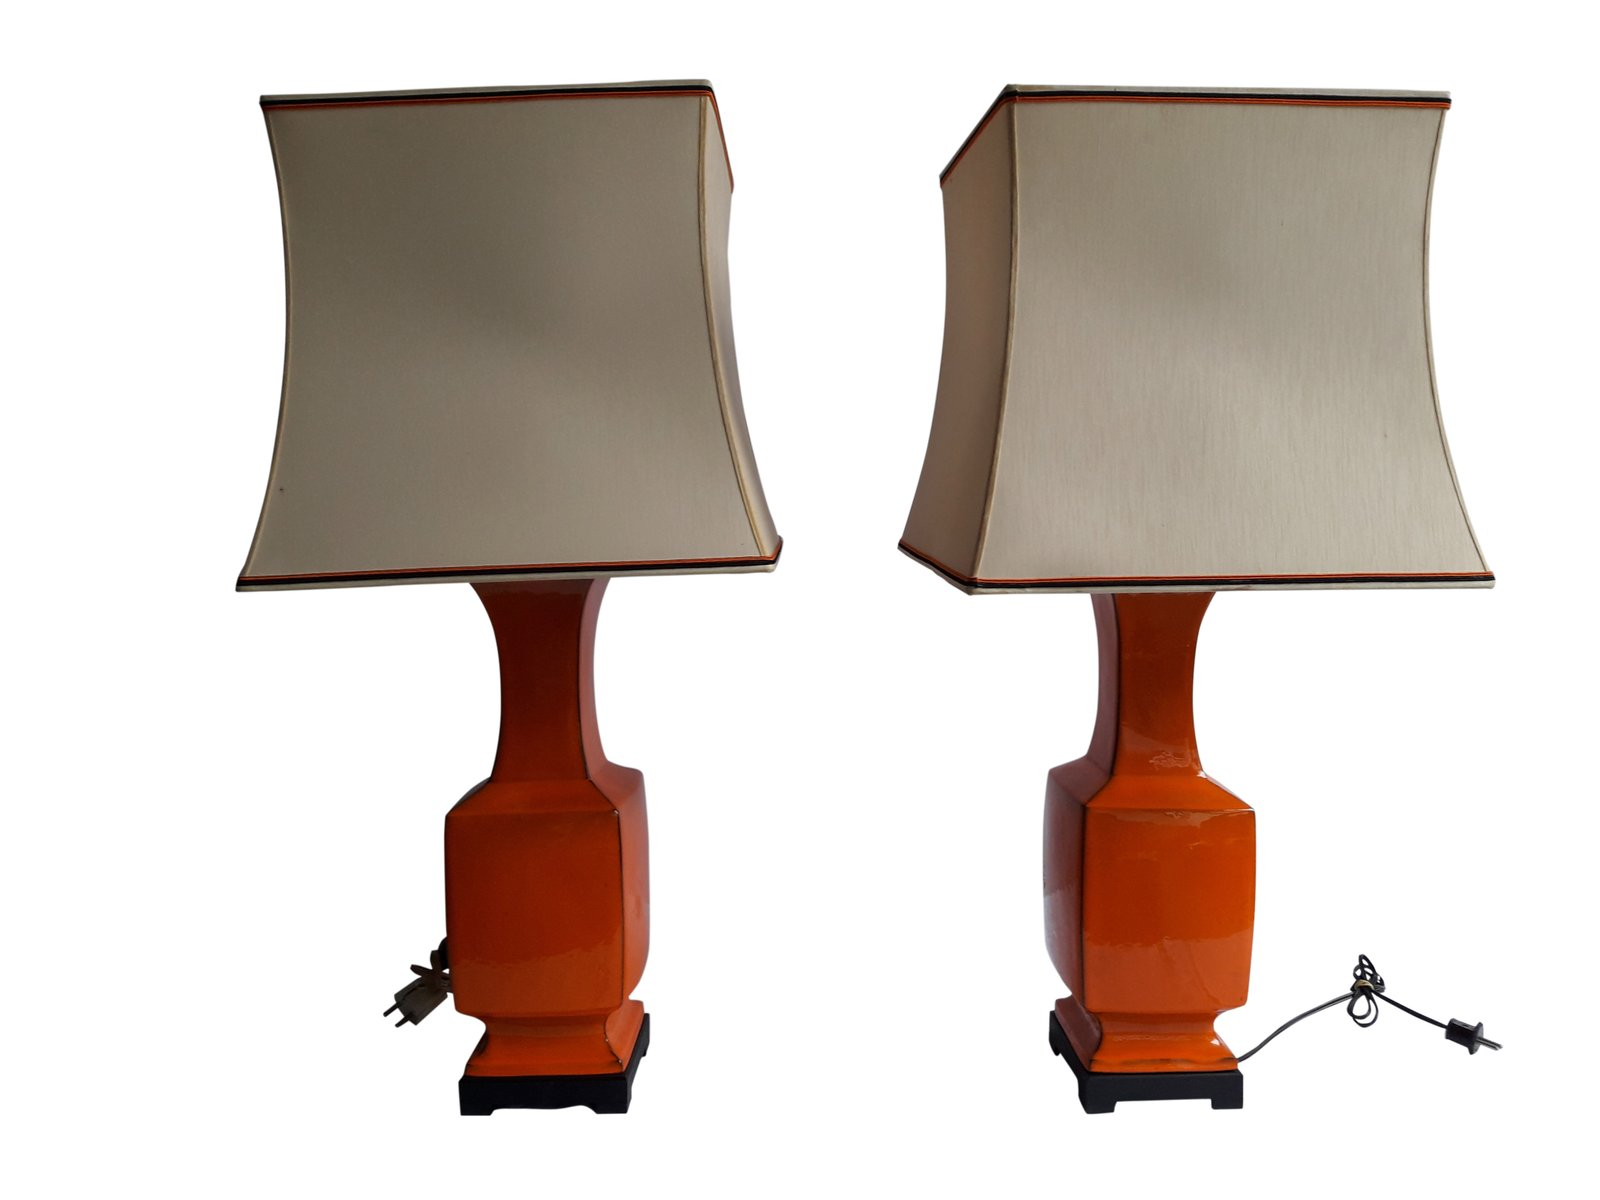 Vintage Orange Porcelain Table Lamps, Set Of 2 For Sale At Pamono